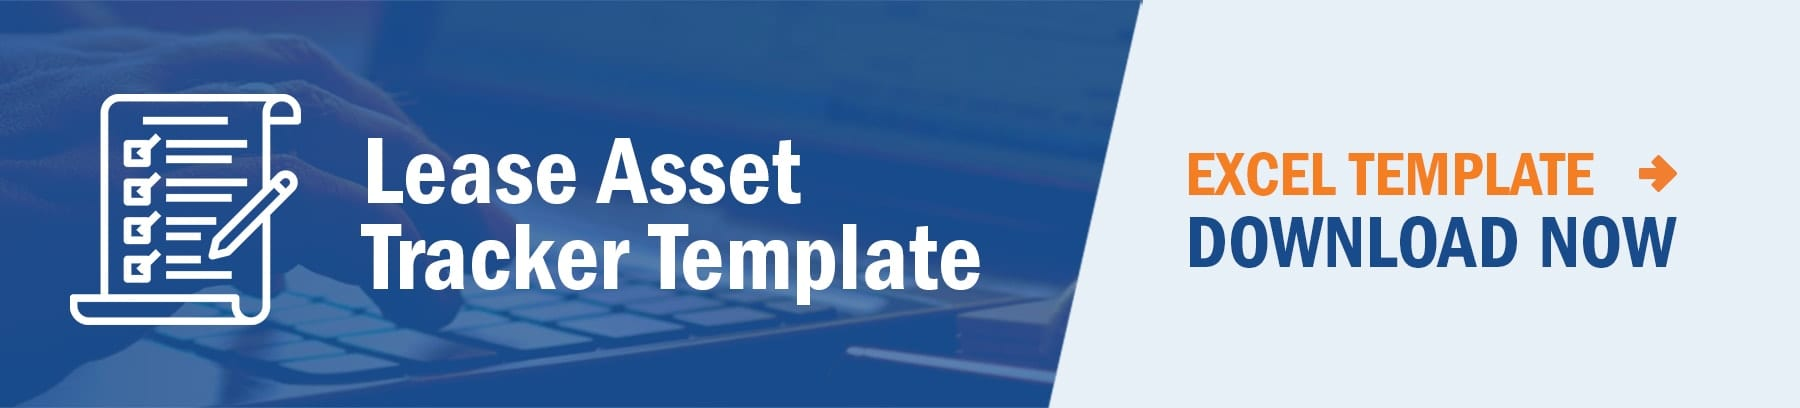 lease asset tracker